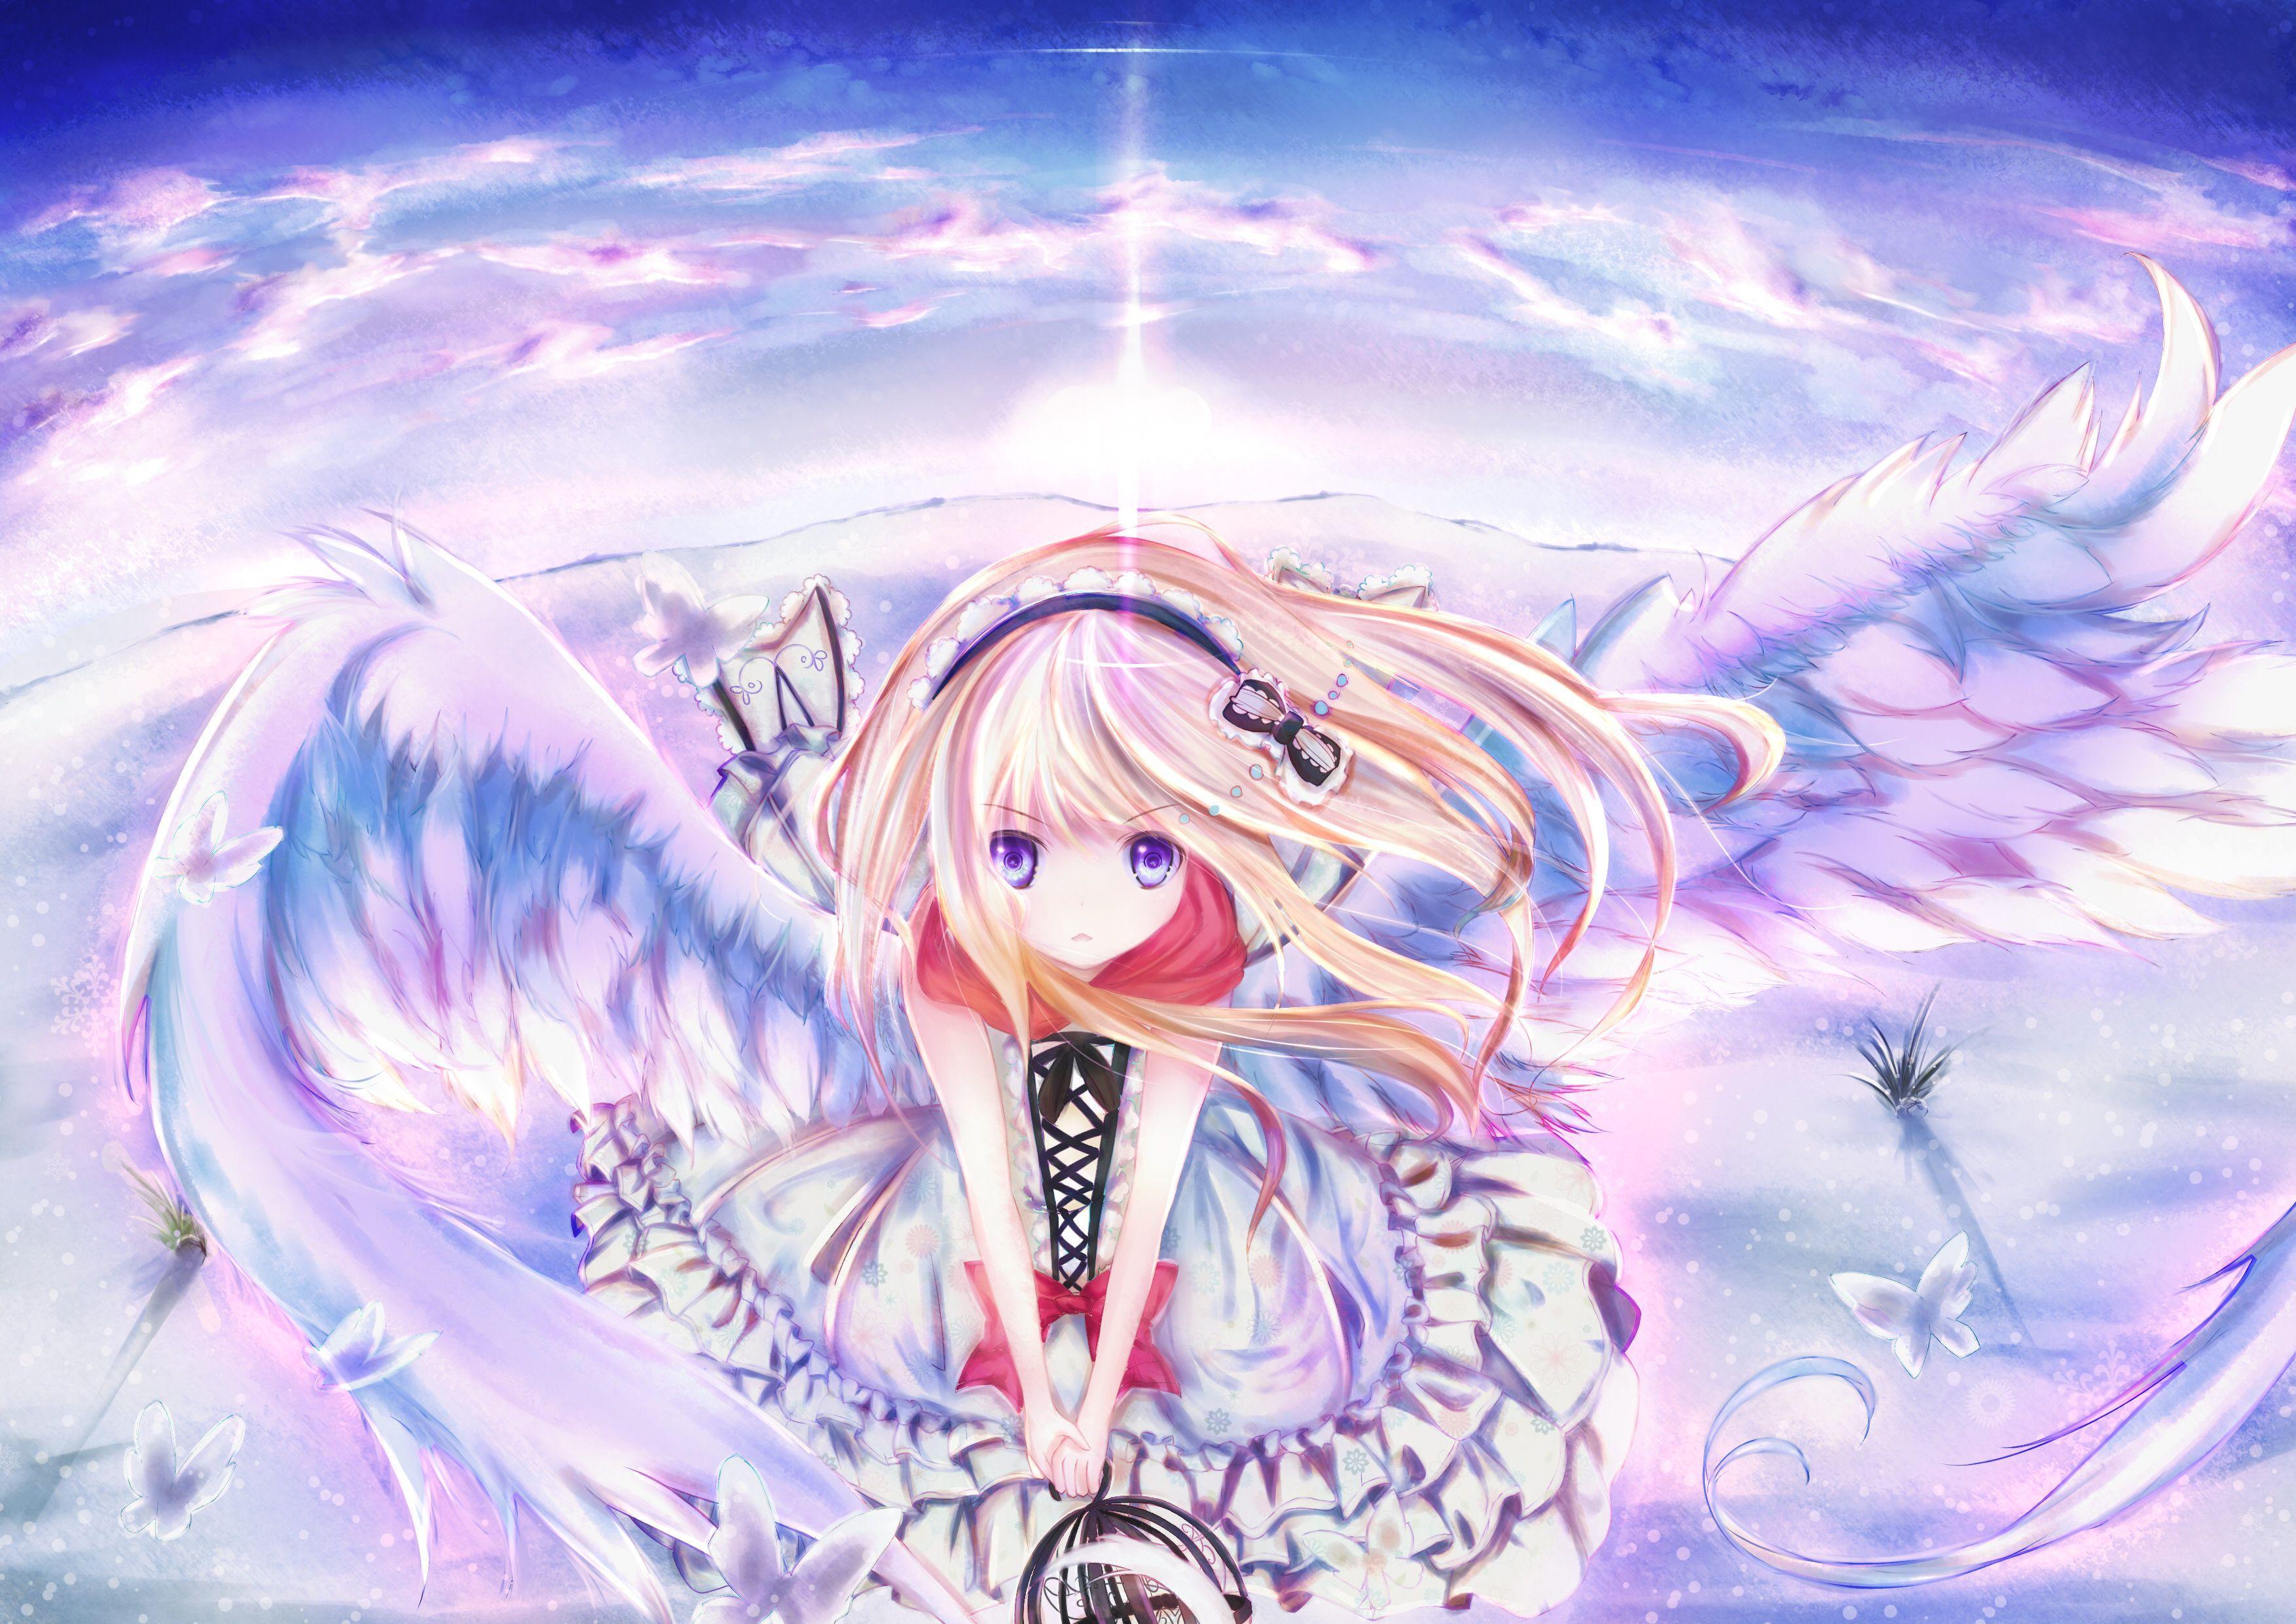 Anime Angel Girl Wallpapers Top Free Anime Angel Girl